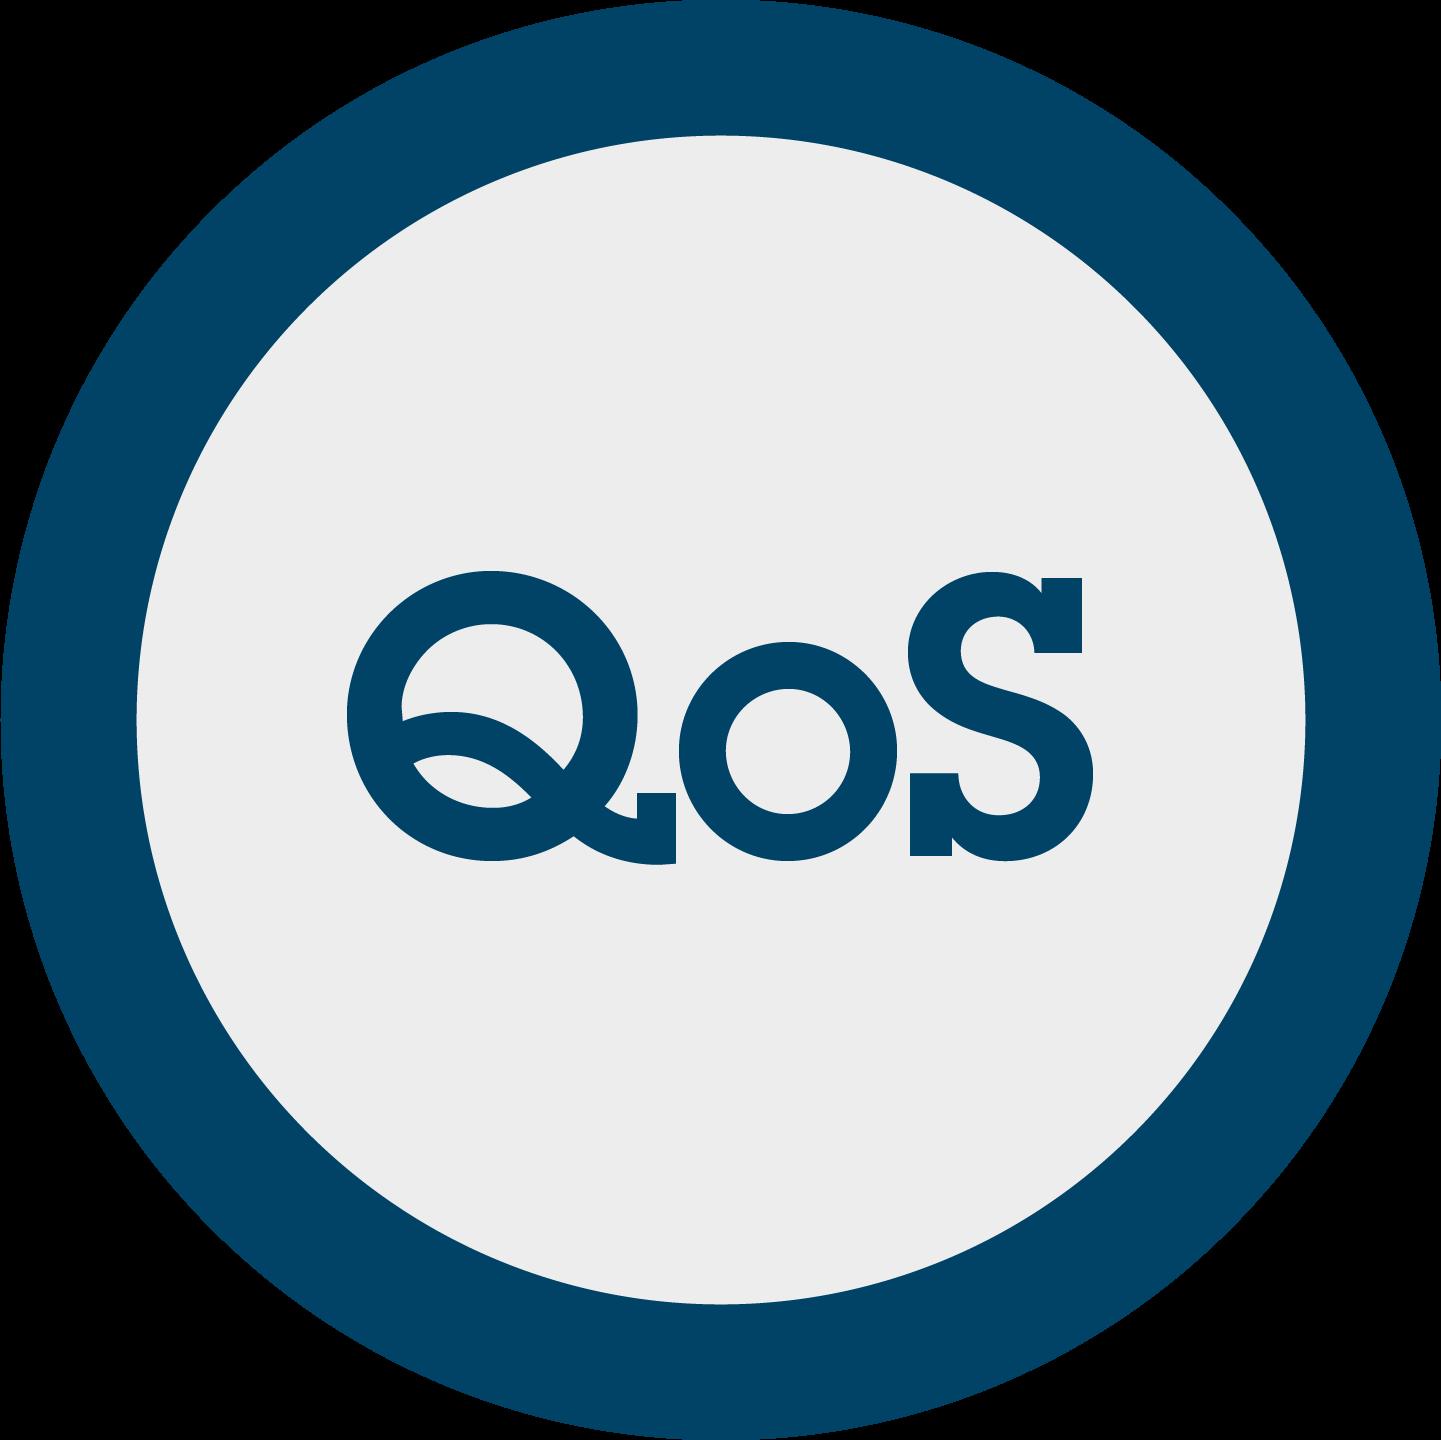 QoS [Quality Of Service]